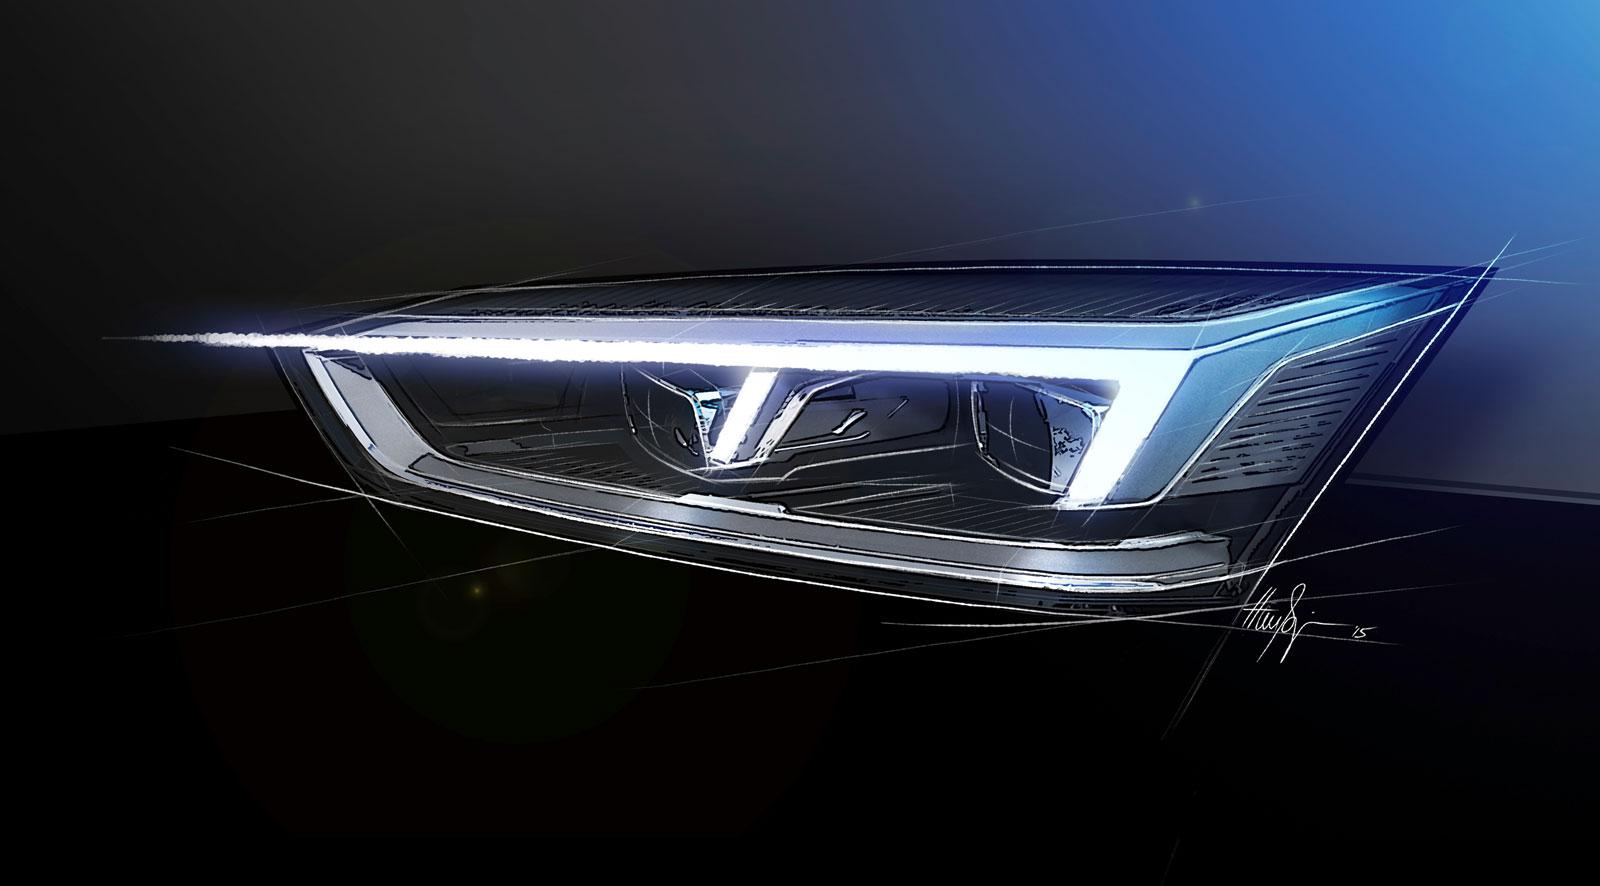 Audi A5 Coupe Headlight Design Sketch Render Car Body Design